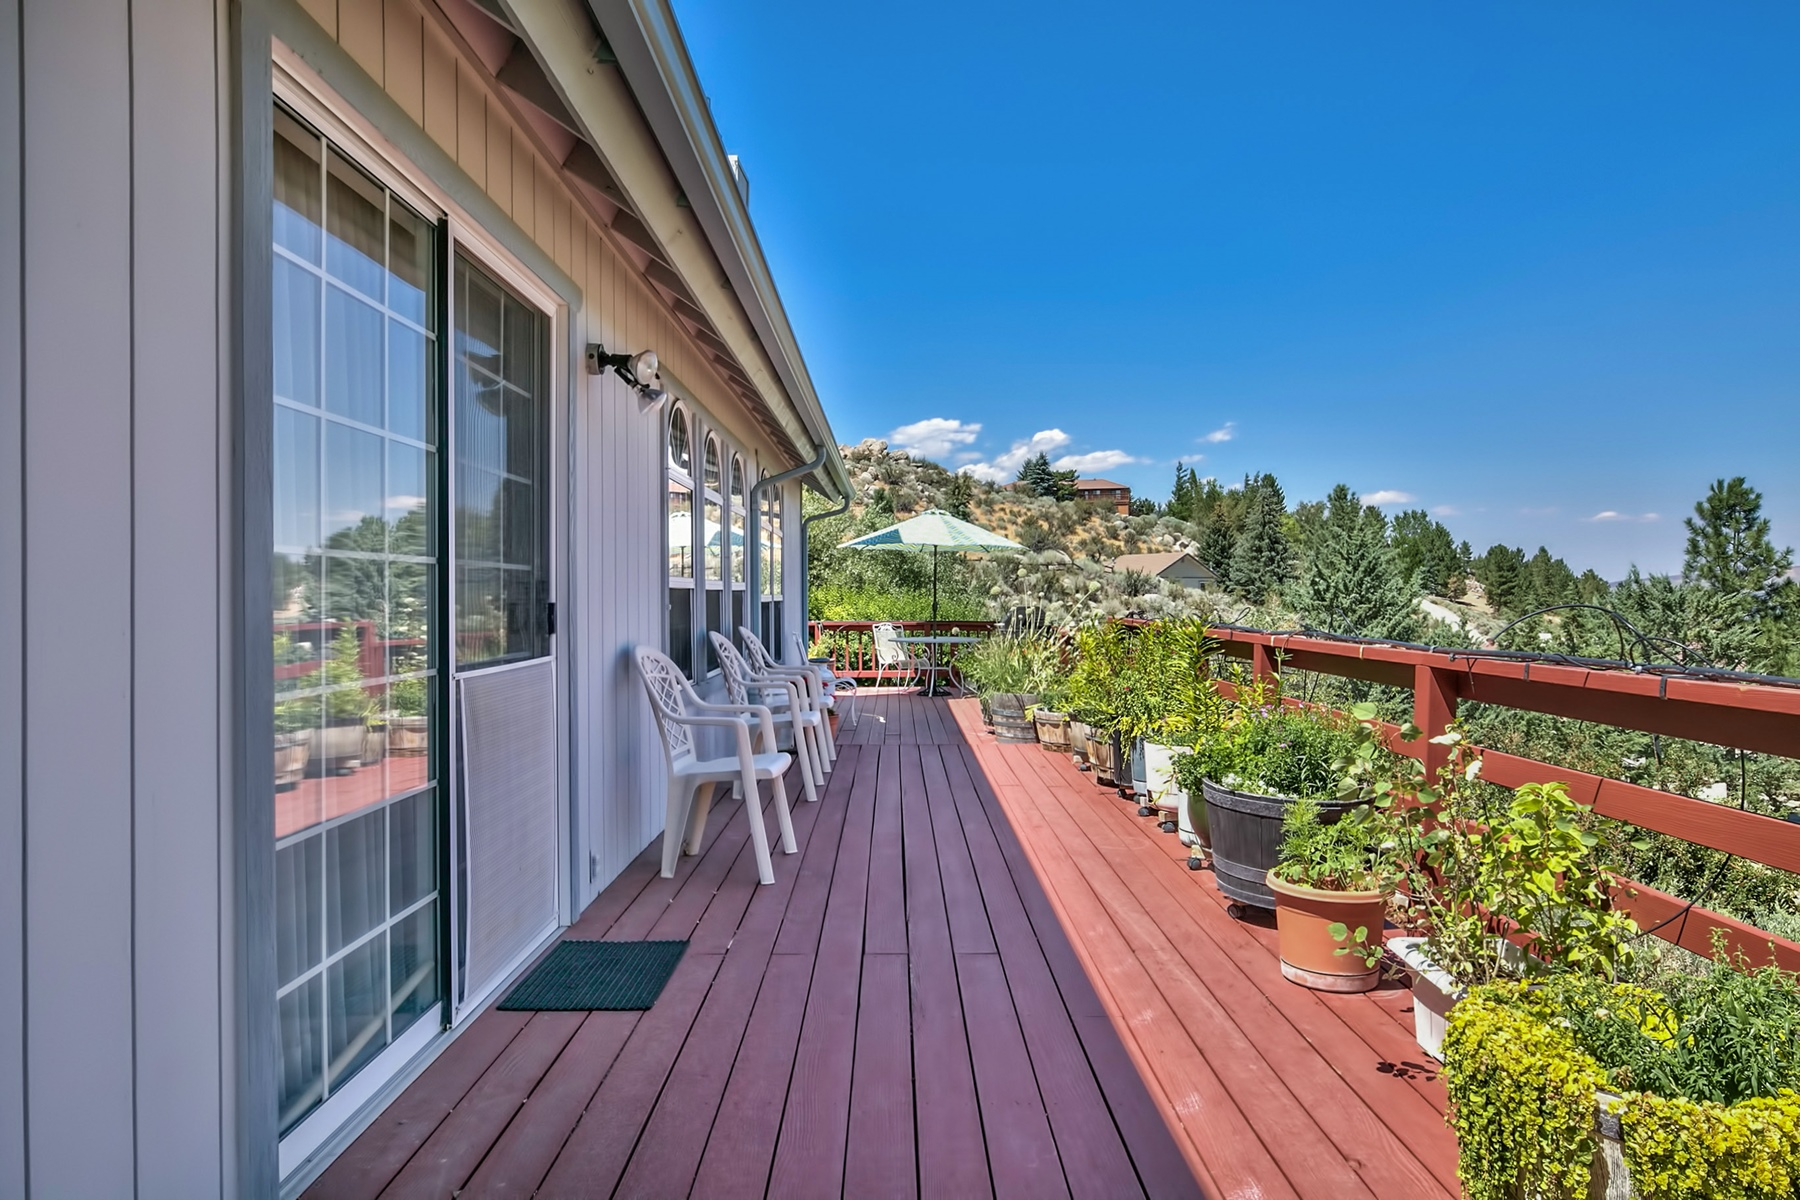 Single Family Home for Sale at 4731 Fox Creek Carson City Nevada, 89703 Carson City, Nevada, 89703 Lake Tahoe, United States